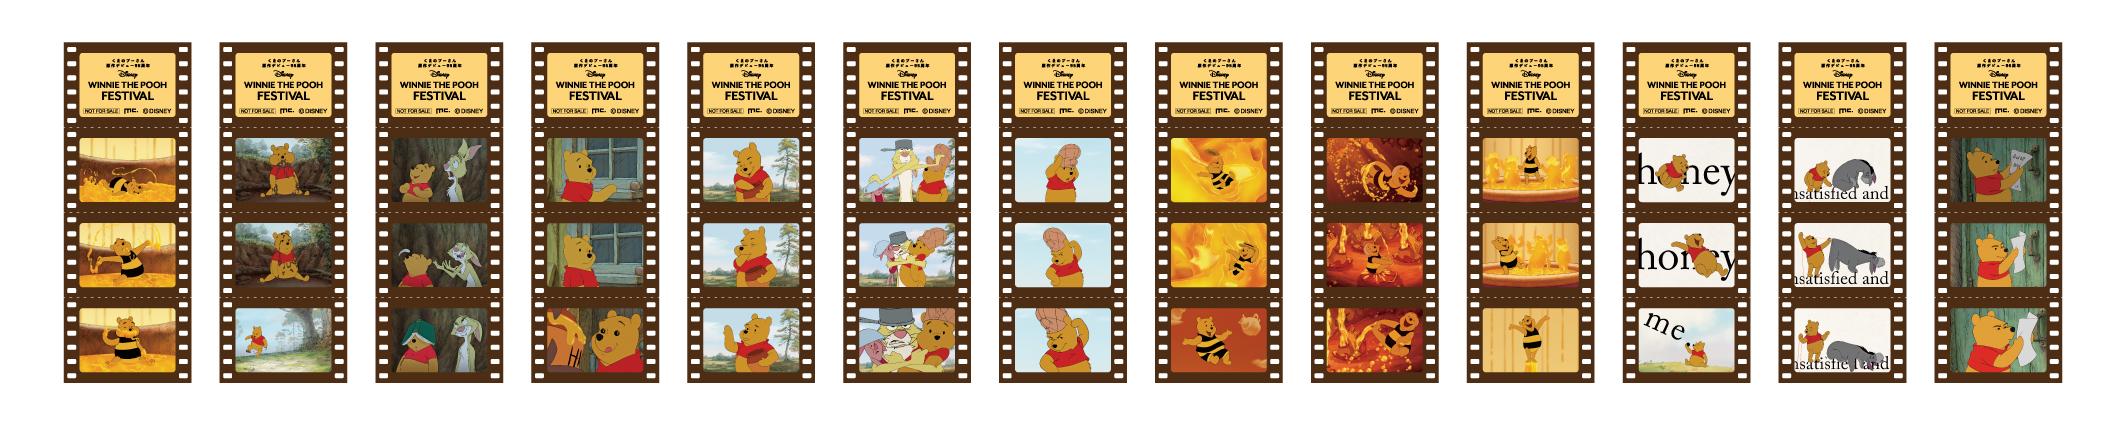 disney-winnie-the-pooh-festival6